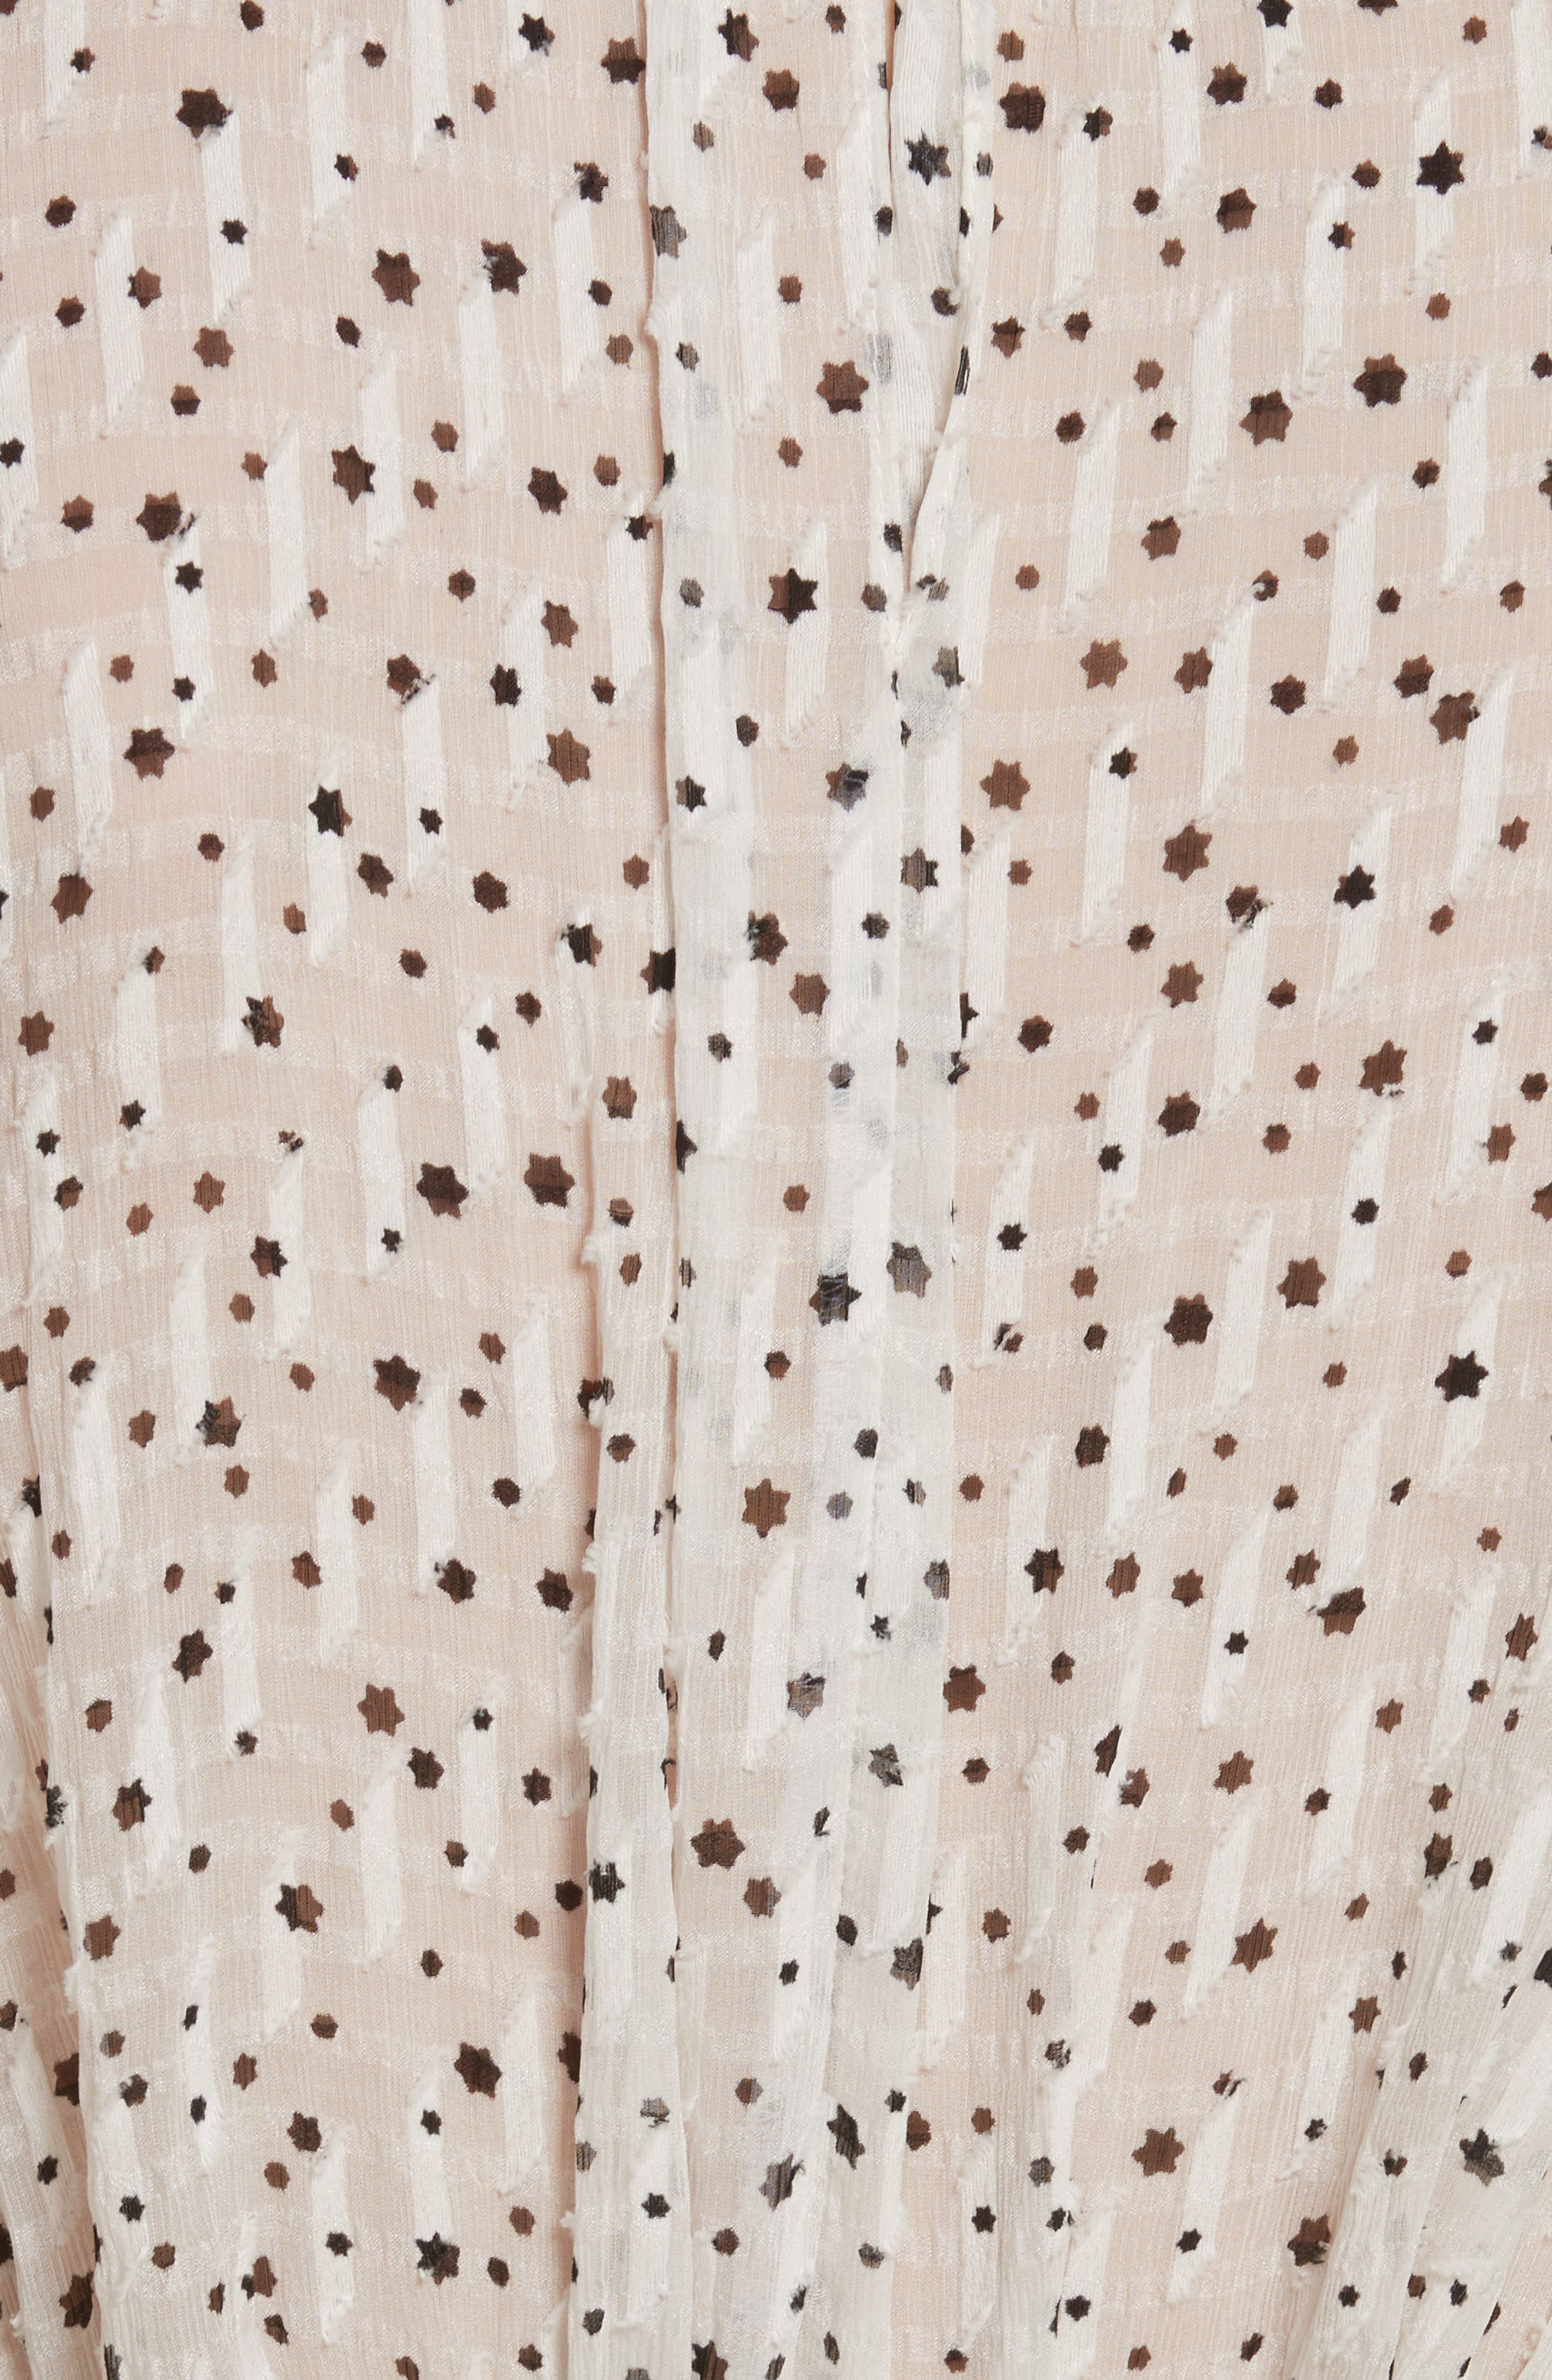 Star Tie Silk Blend Blouse,                             Alternate thumbnail 5, color,                             103